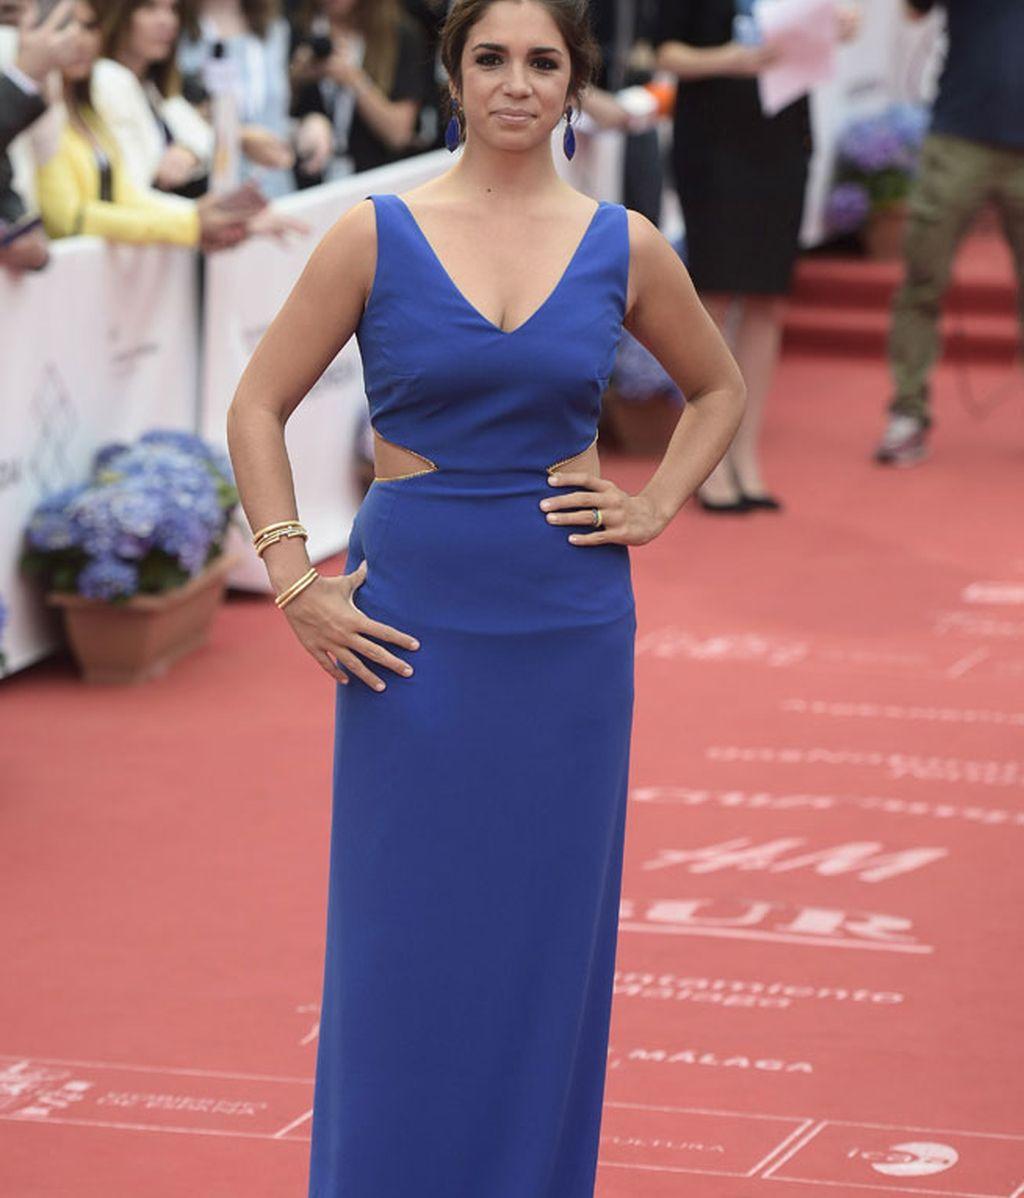 Elena Furiase,con vestido azul con aberturas laterales a lo 'cut out'